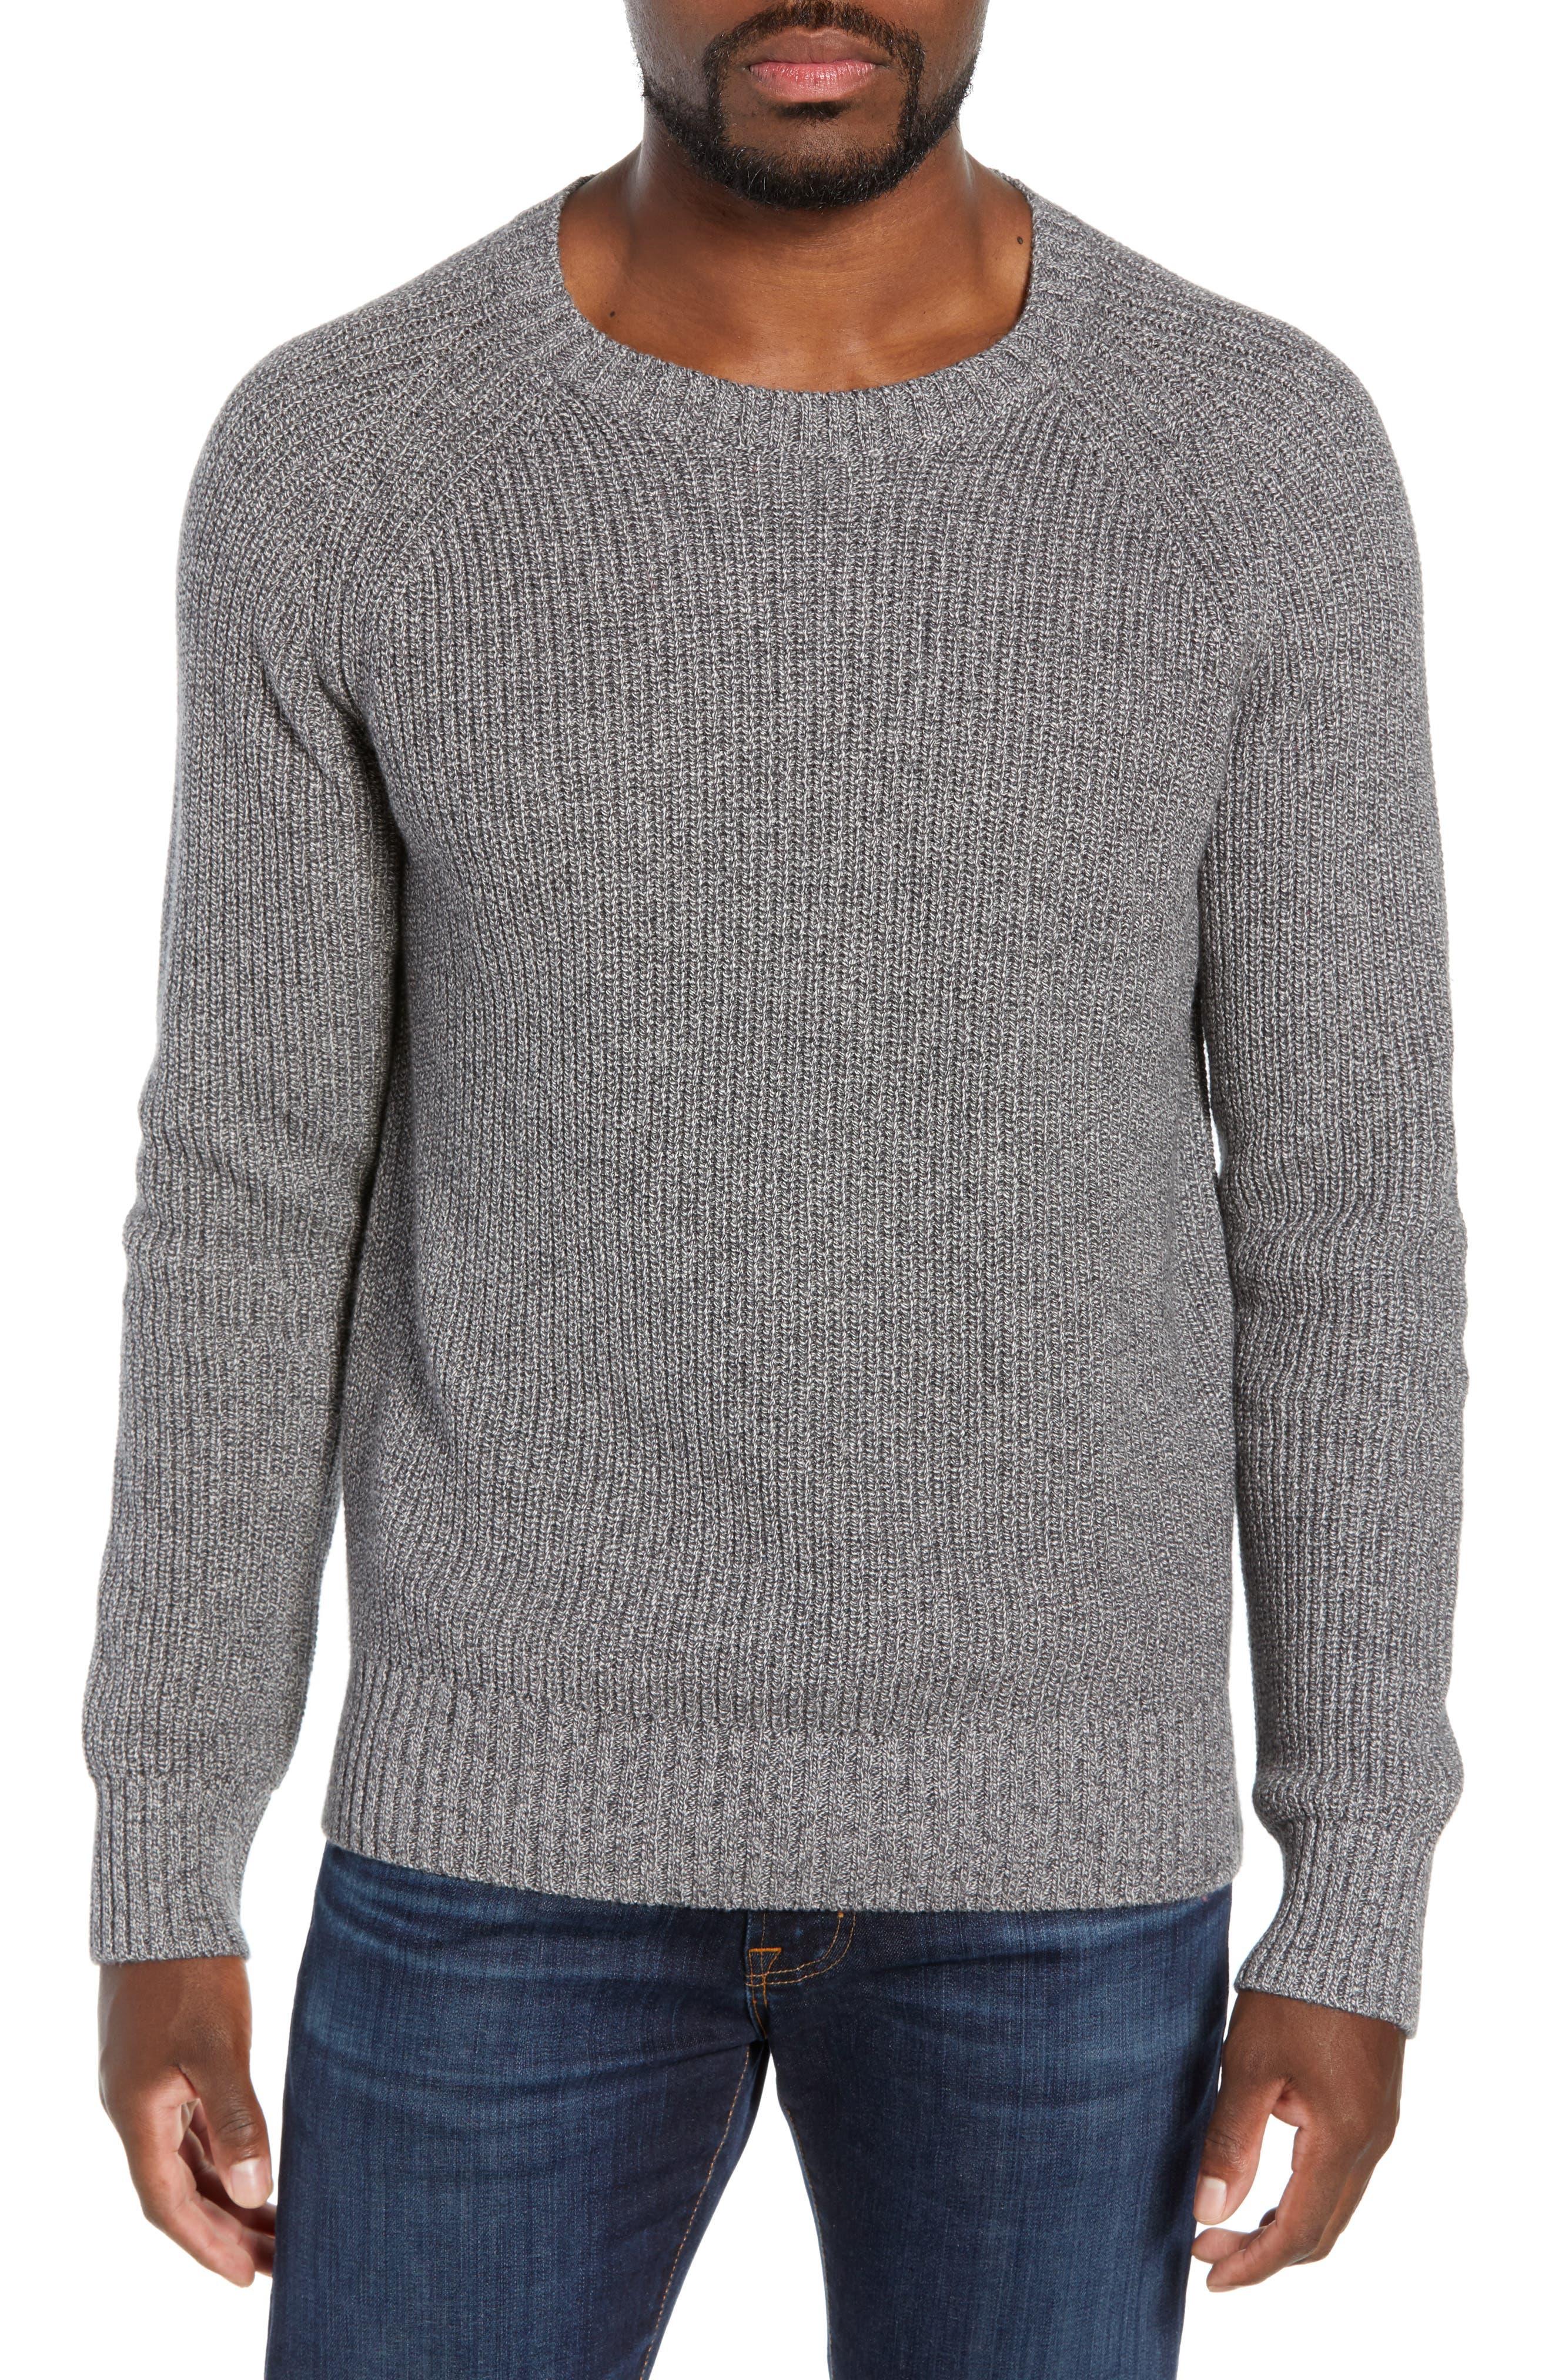 Bonobos Slim Fit Cotton & Cashmere Sweater, Grey